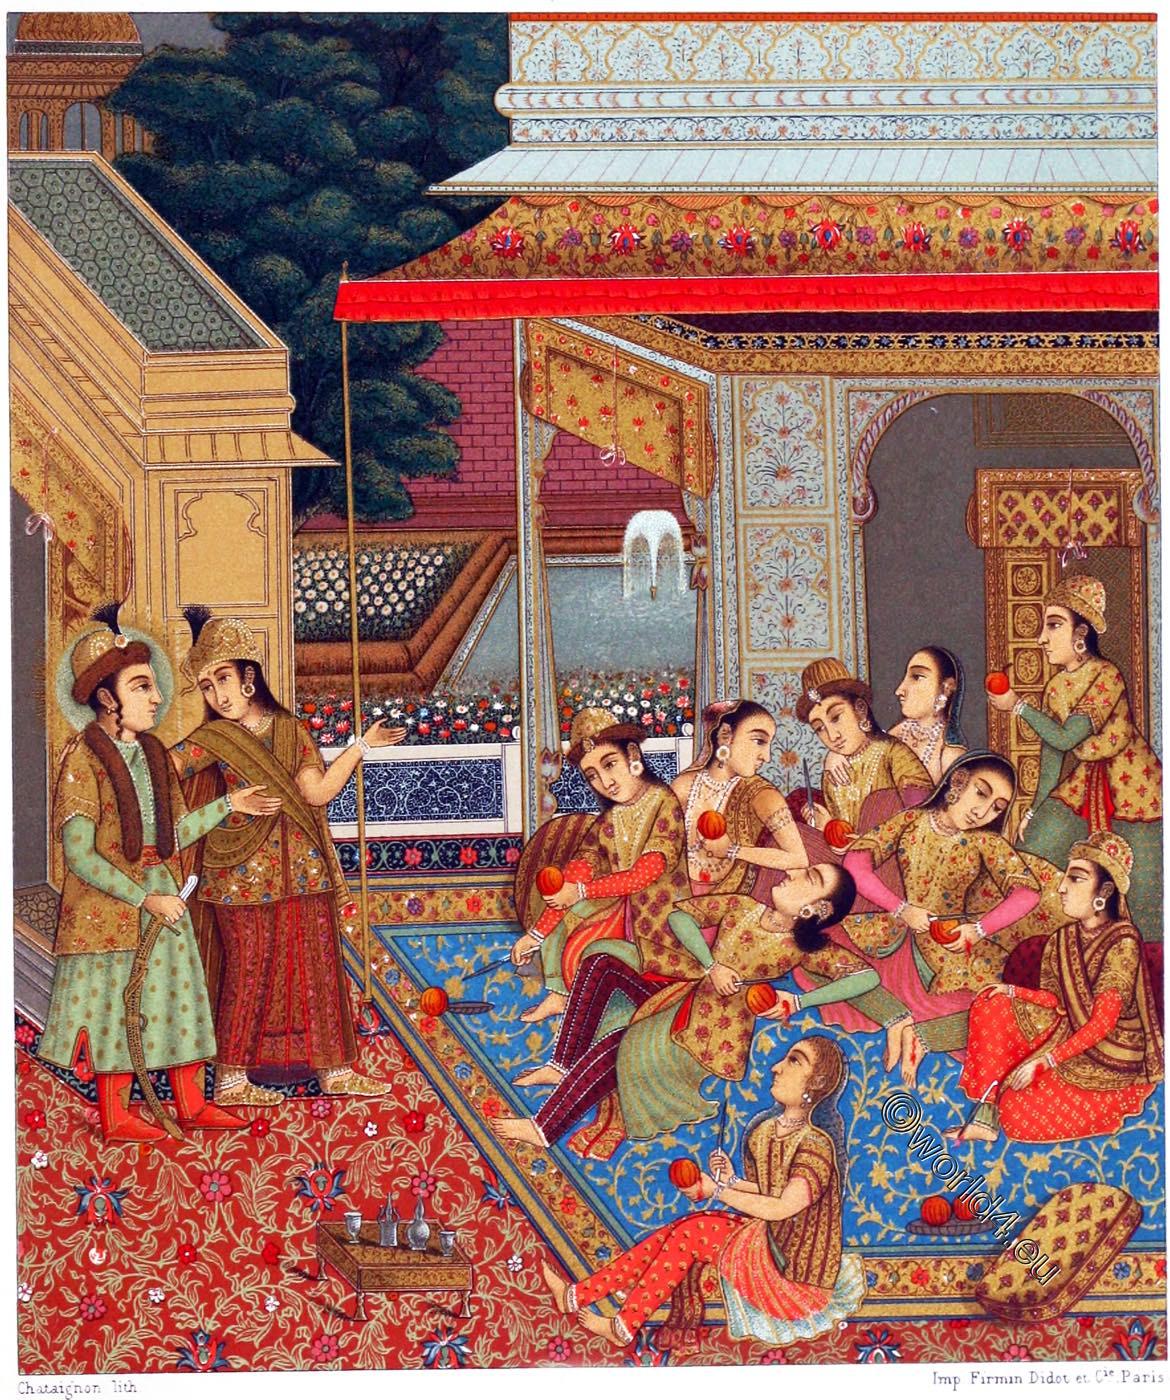 Indian harem, courtyard, Zuleikha, miniature, painting, Mughal, Empire, Auguste Racinet